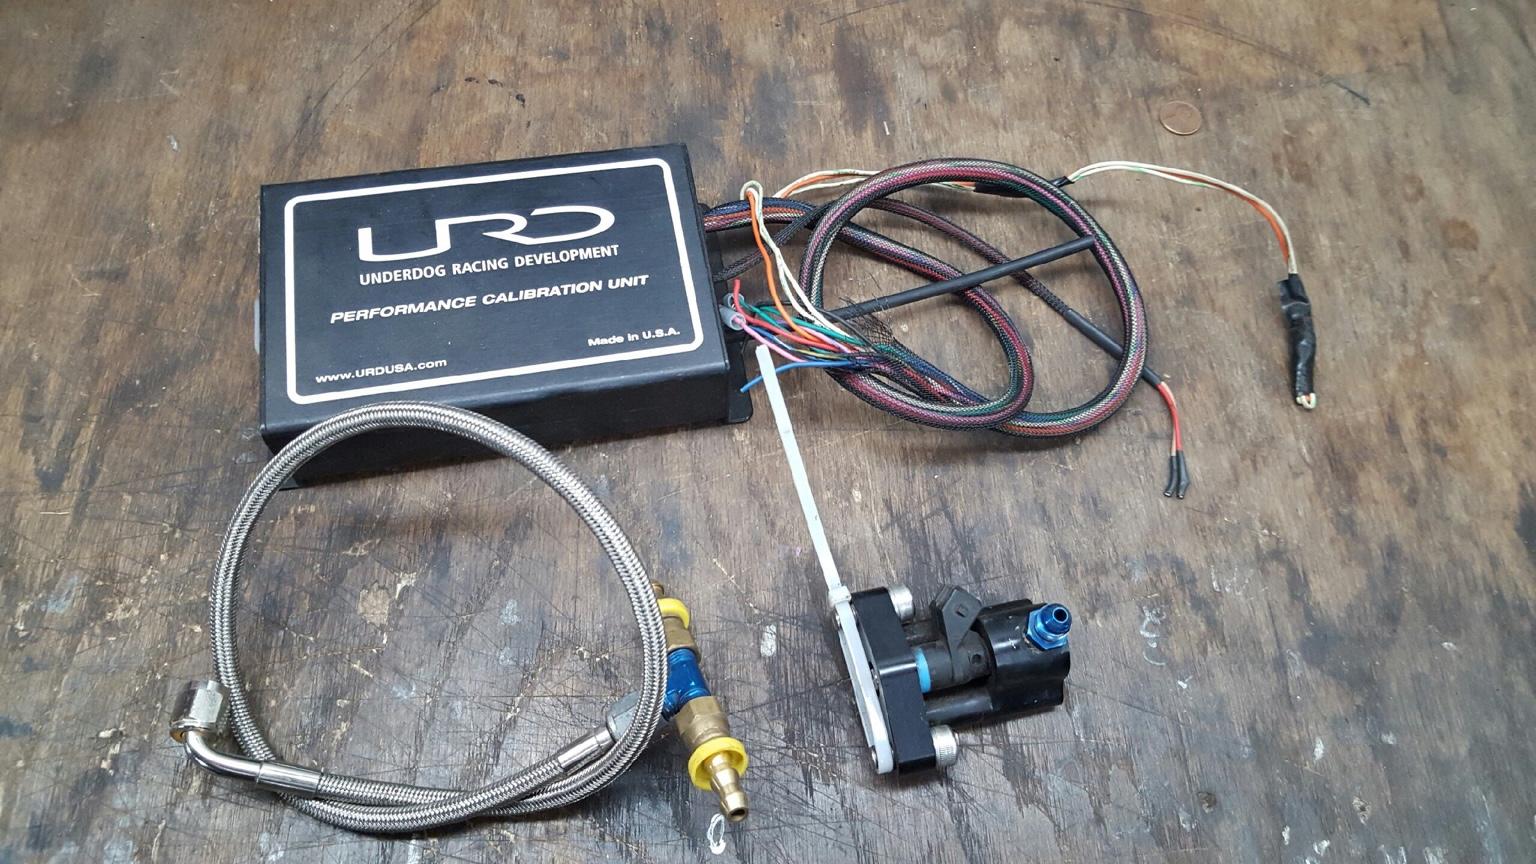 Fantastic Urd Wire Elaboration - The Best Electrical Circuit Diagram ...